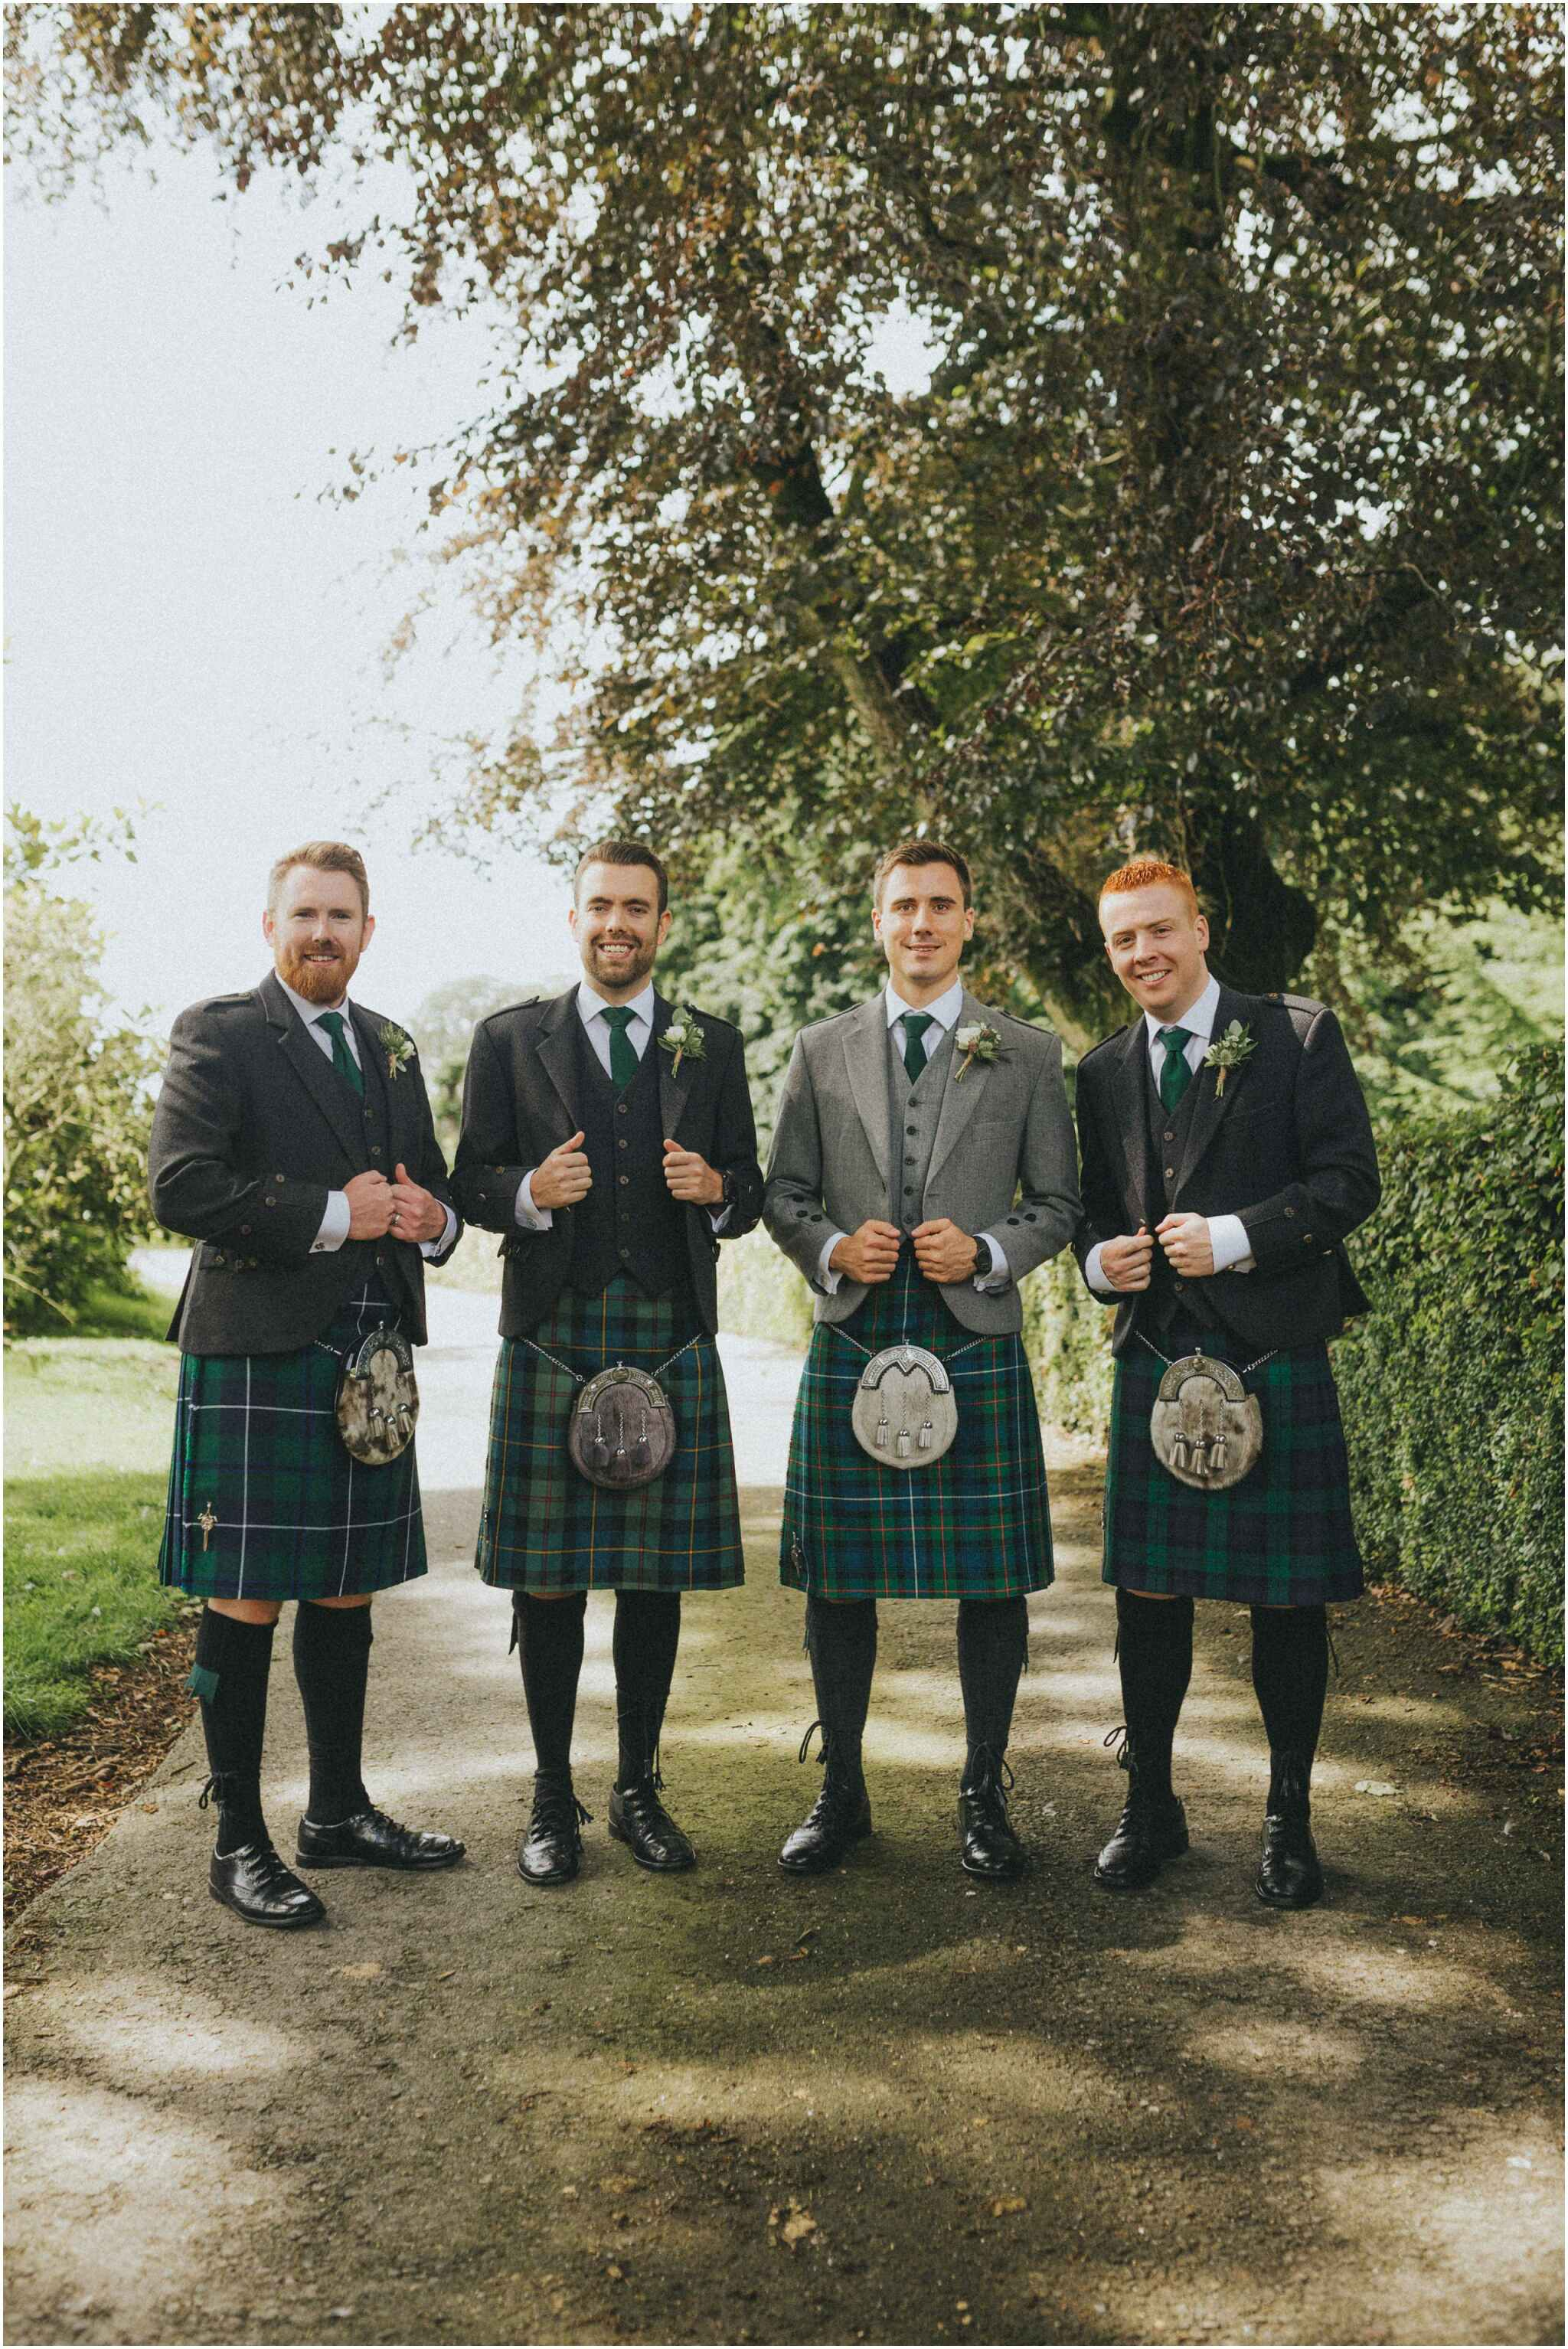 Fionnuala + Paul - Mount Druid Alternative Wedding 46